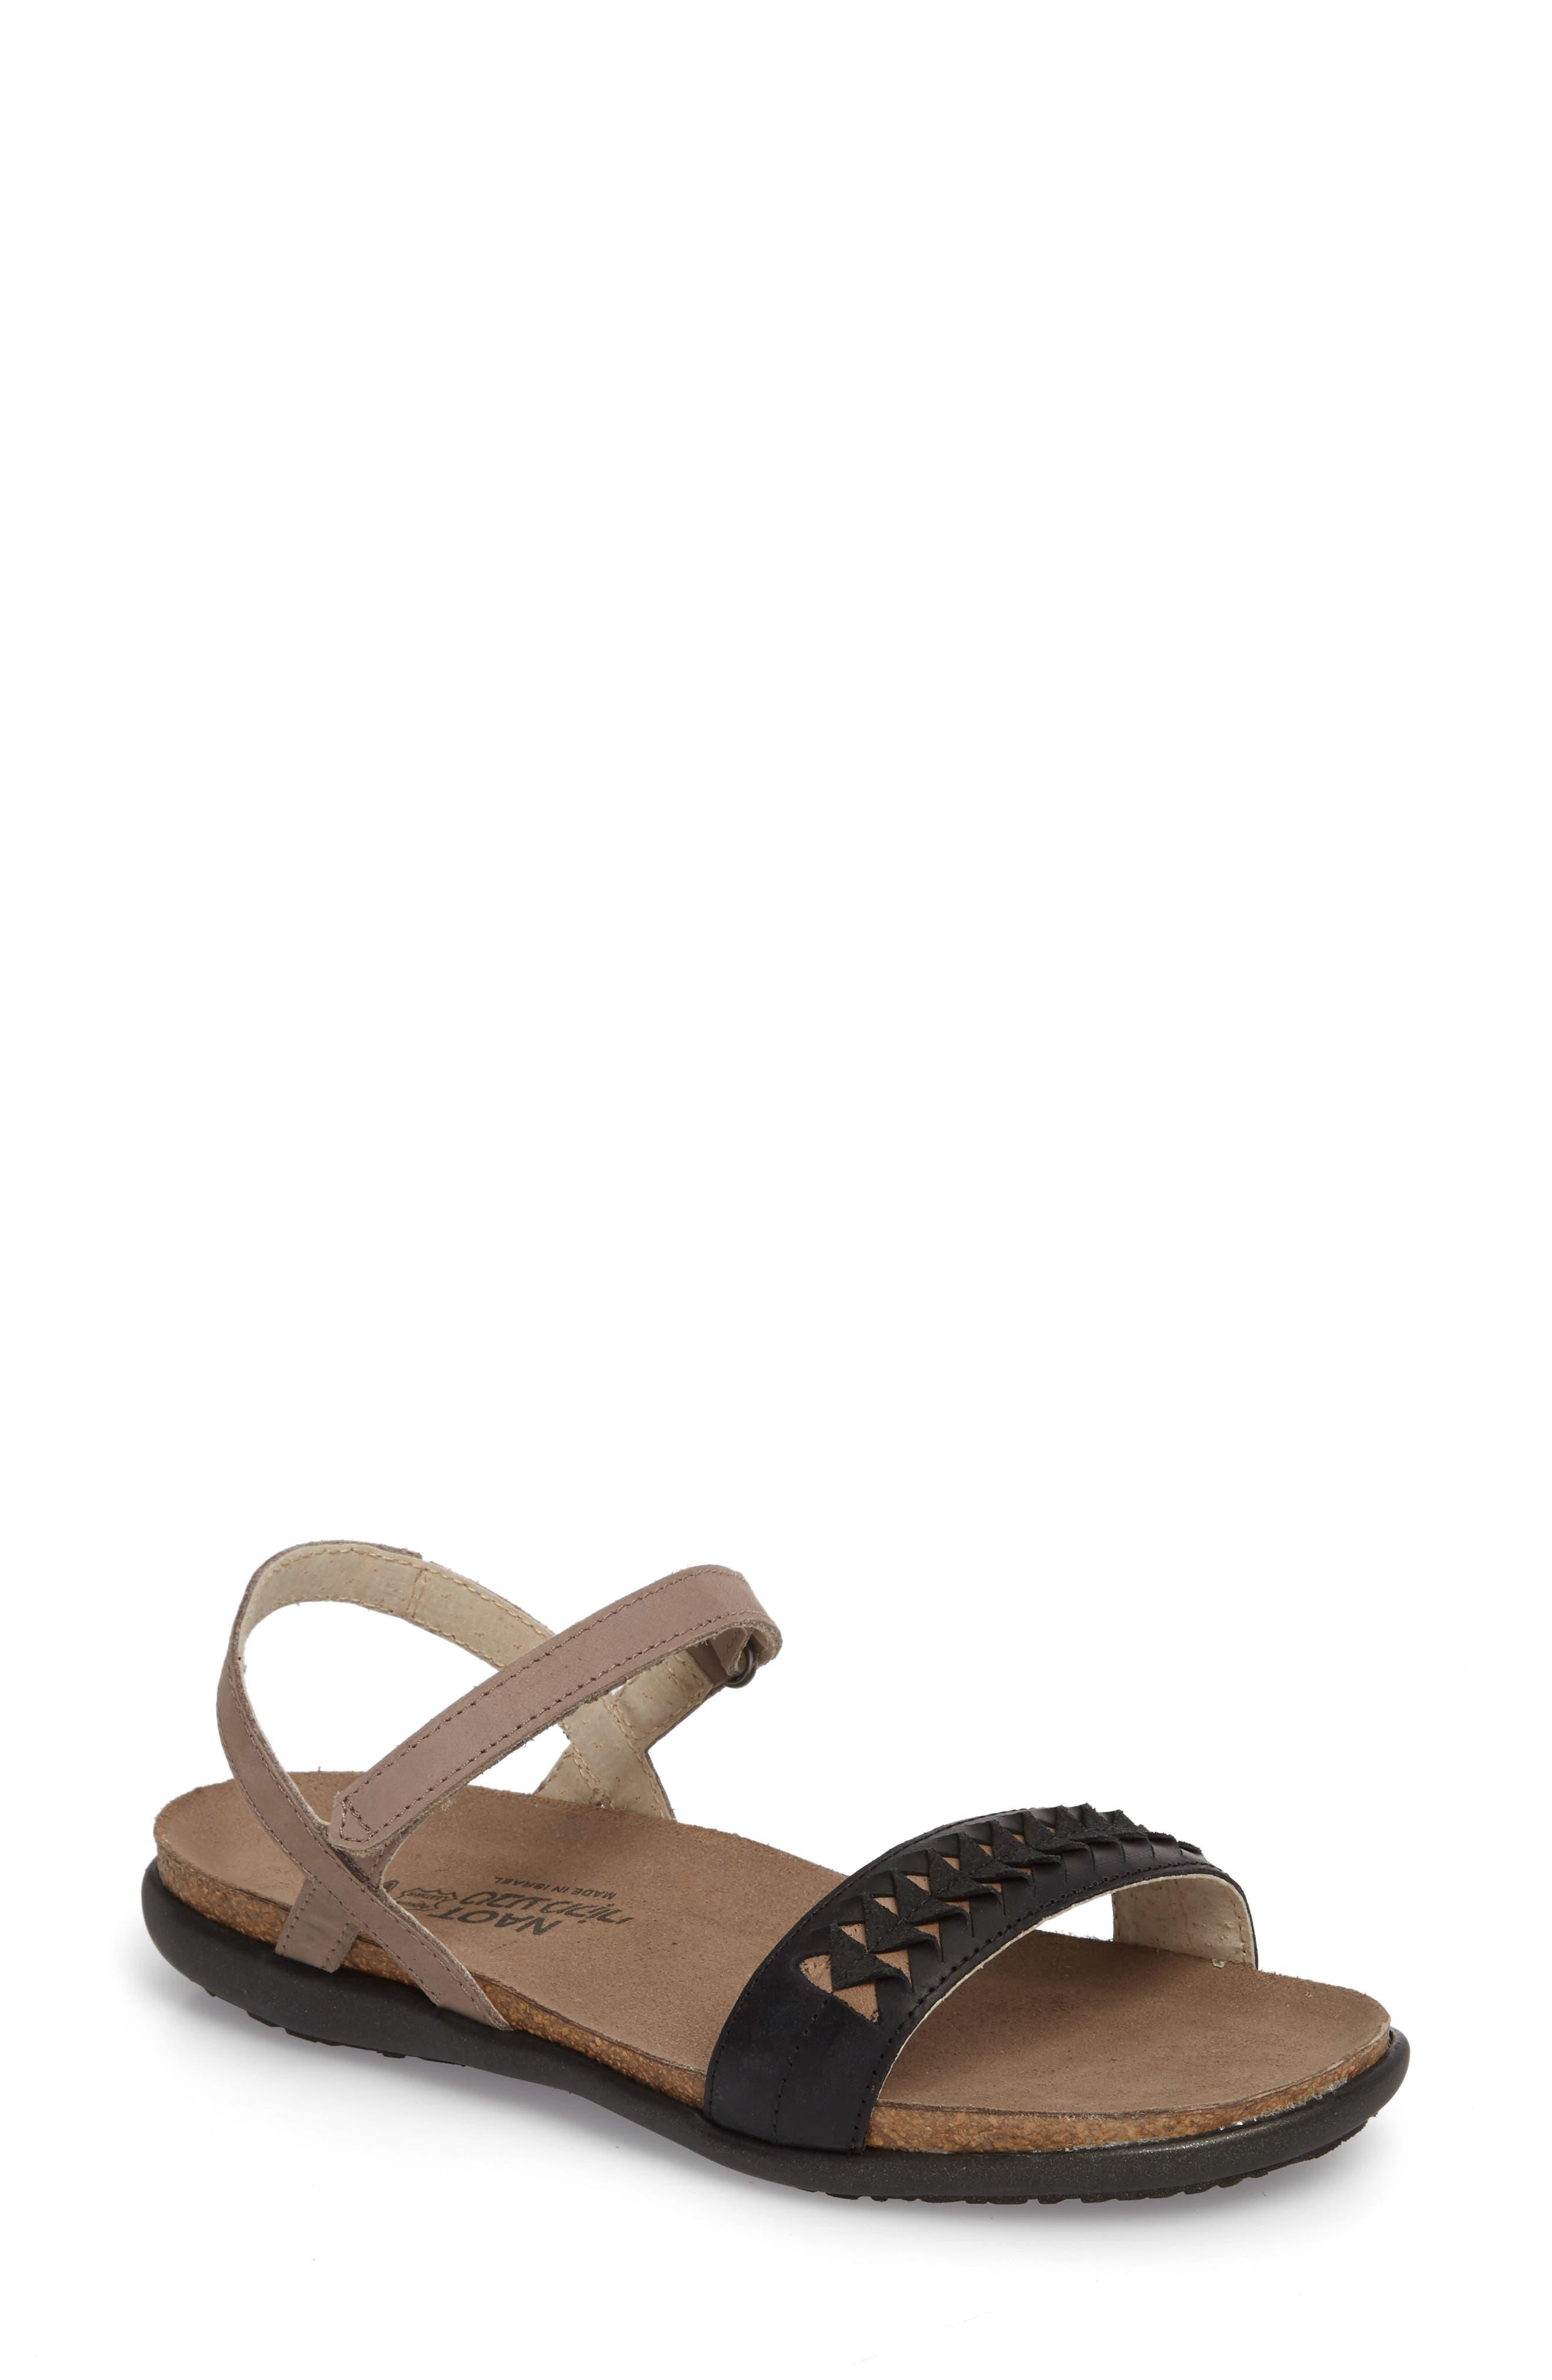 NAOT Marble Sandal, Main, color, STONE NUBUCK